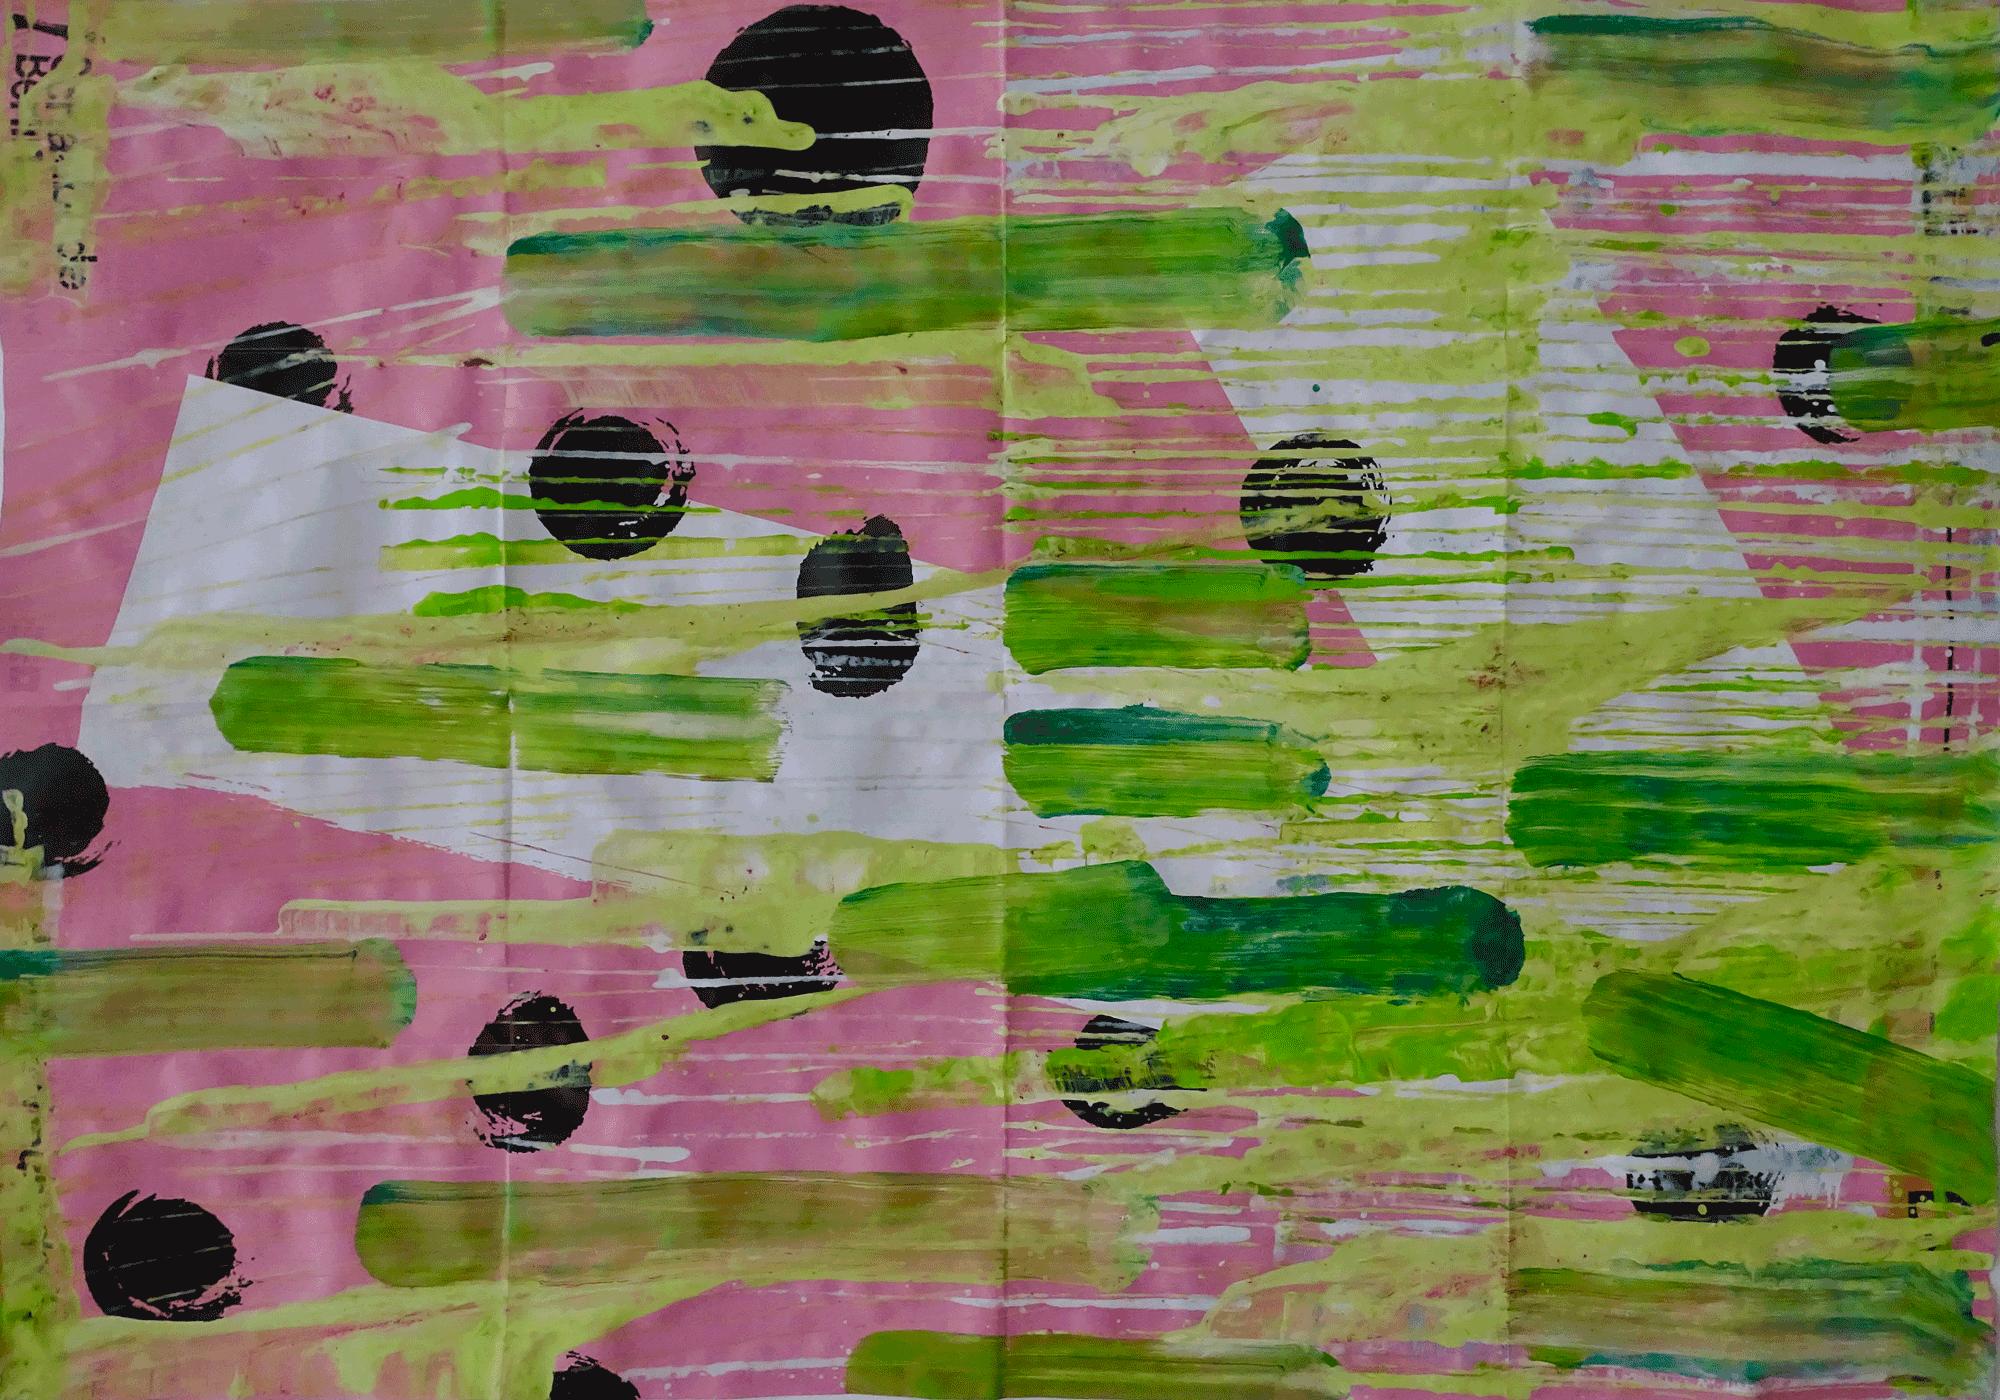 Yvonne Andreini, Springbunny, 2019, 42 x 59 cm, Tusche auf Papier